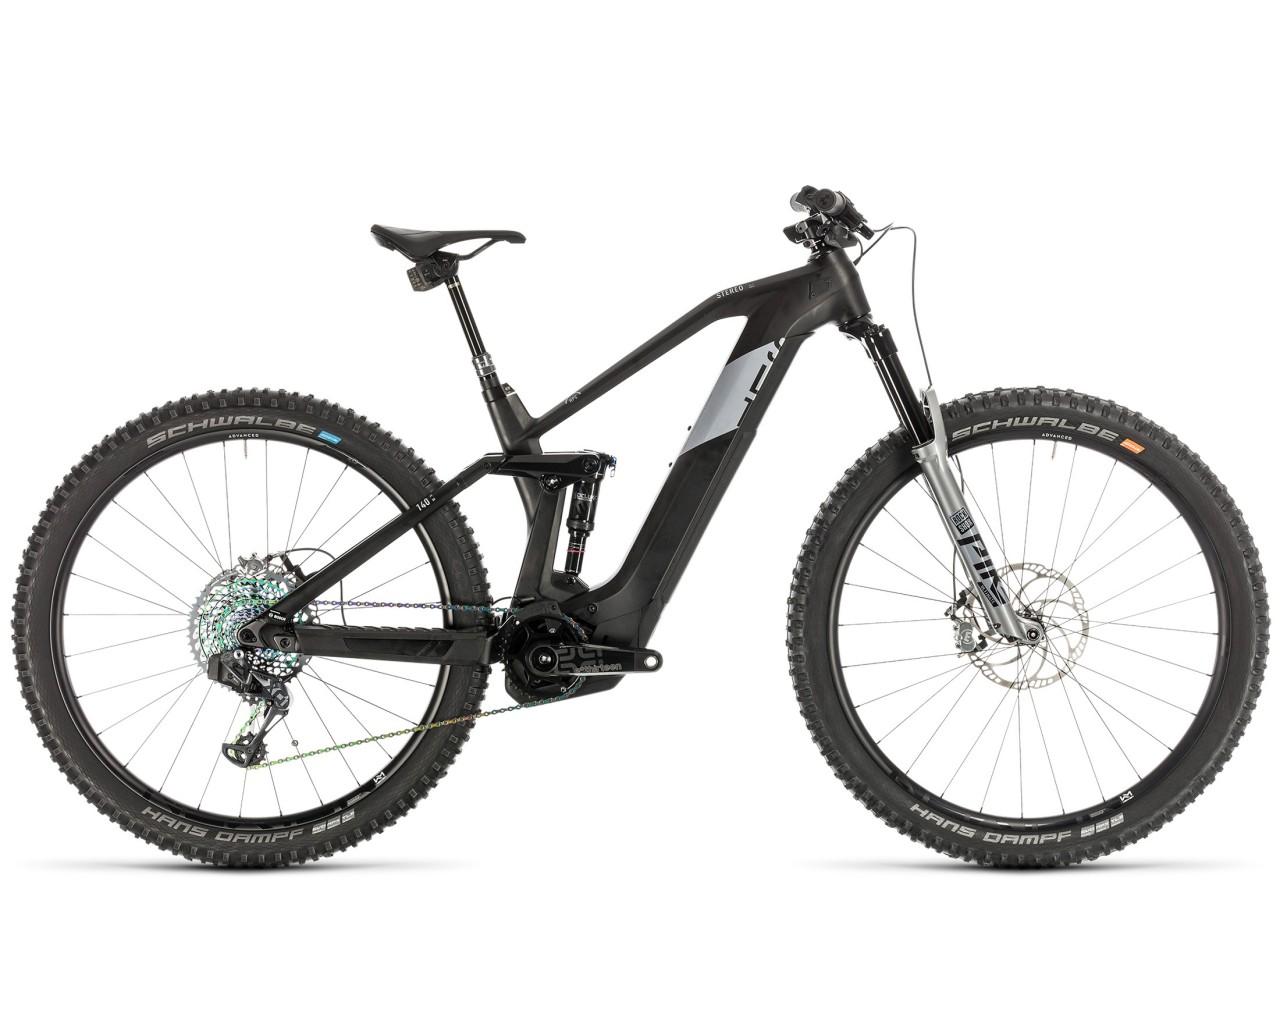 Cube Stereo Hybrid 140 HPC SLT 625 29 - Pedelec Carbon Mountain Bicycle Fullsuspension 2020   carbon n silver